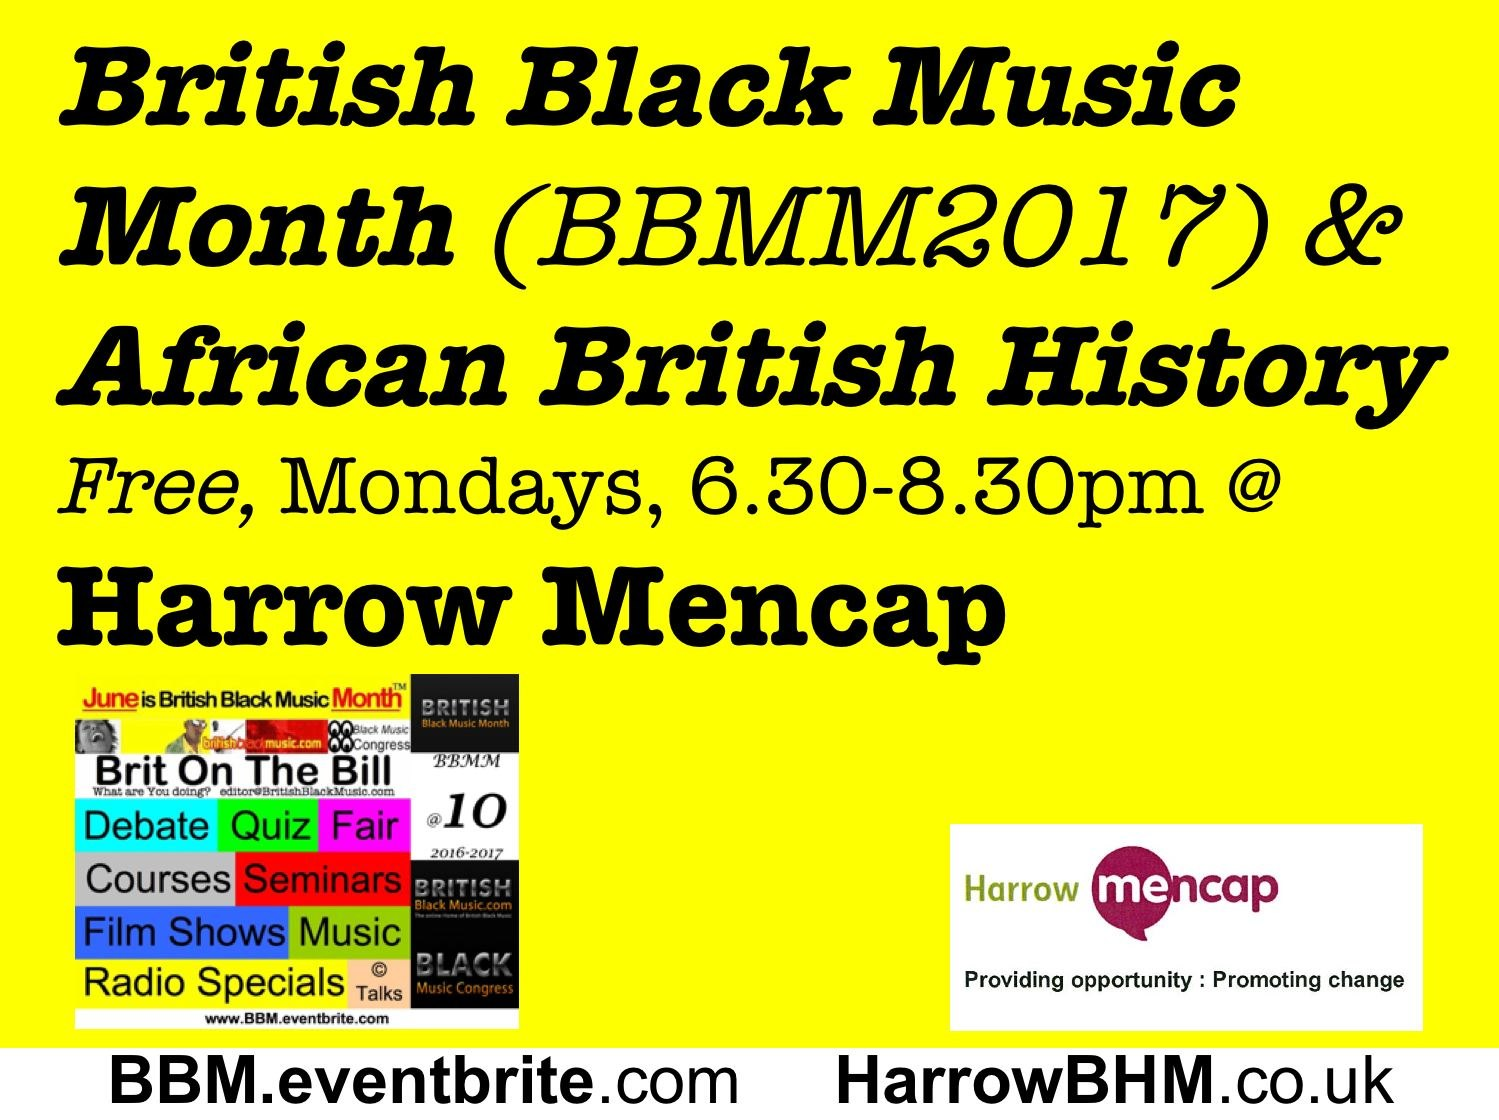 bbmm2017andhistoryatharrowmencap When UK Impacted Upon US Black Music (Kwaku)